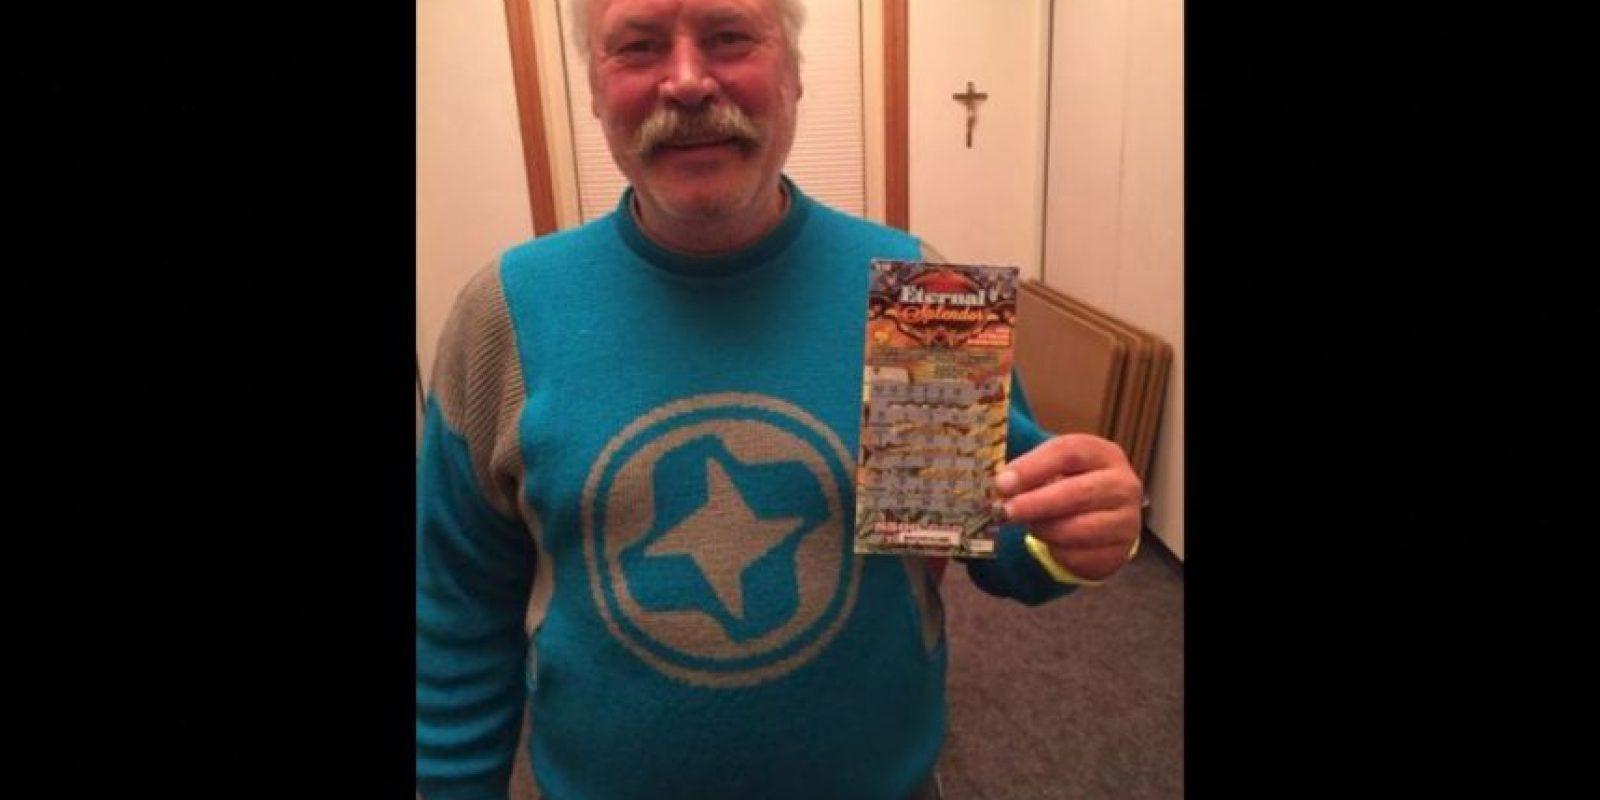 A Michael Engfors le cambió la vida, luego de ganar en la lotería Foto:Aspen Homeless Shelter